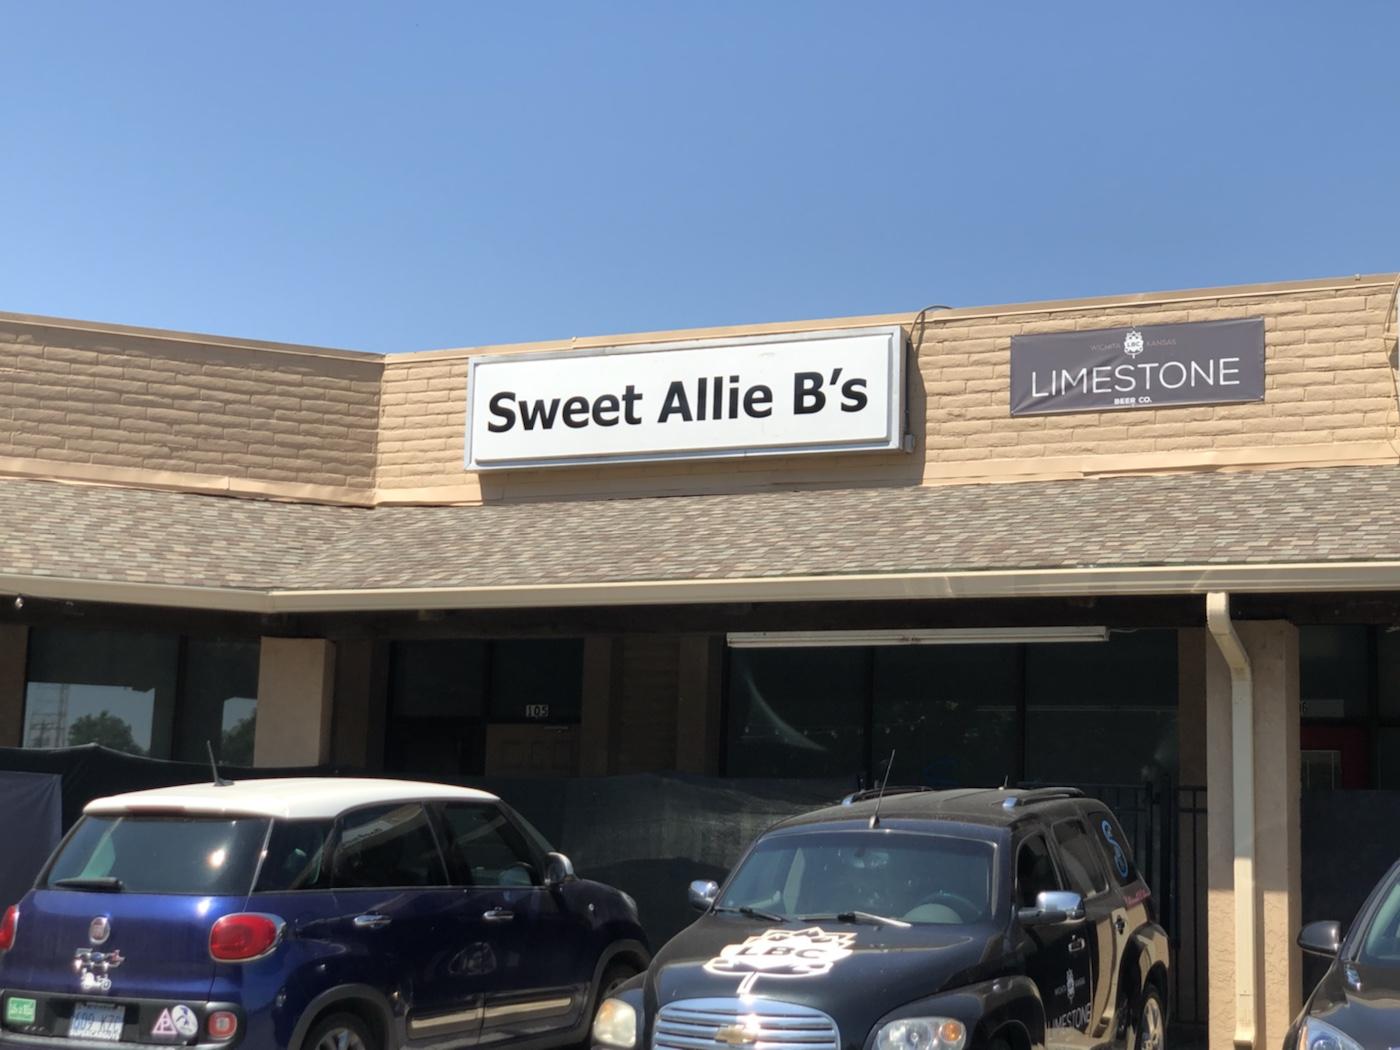 Sweet Allie B's